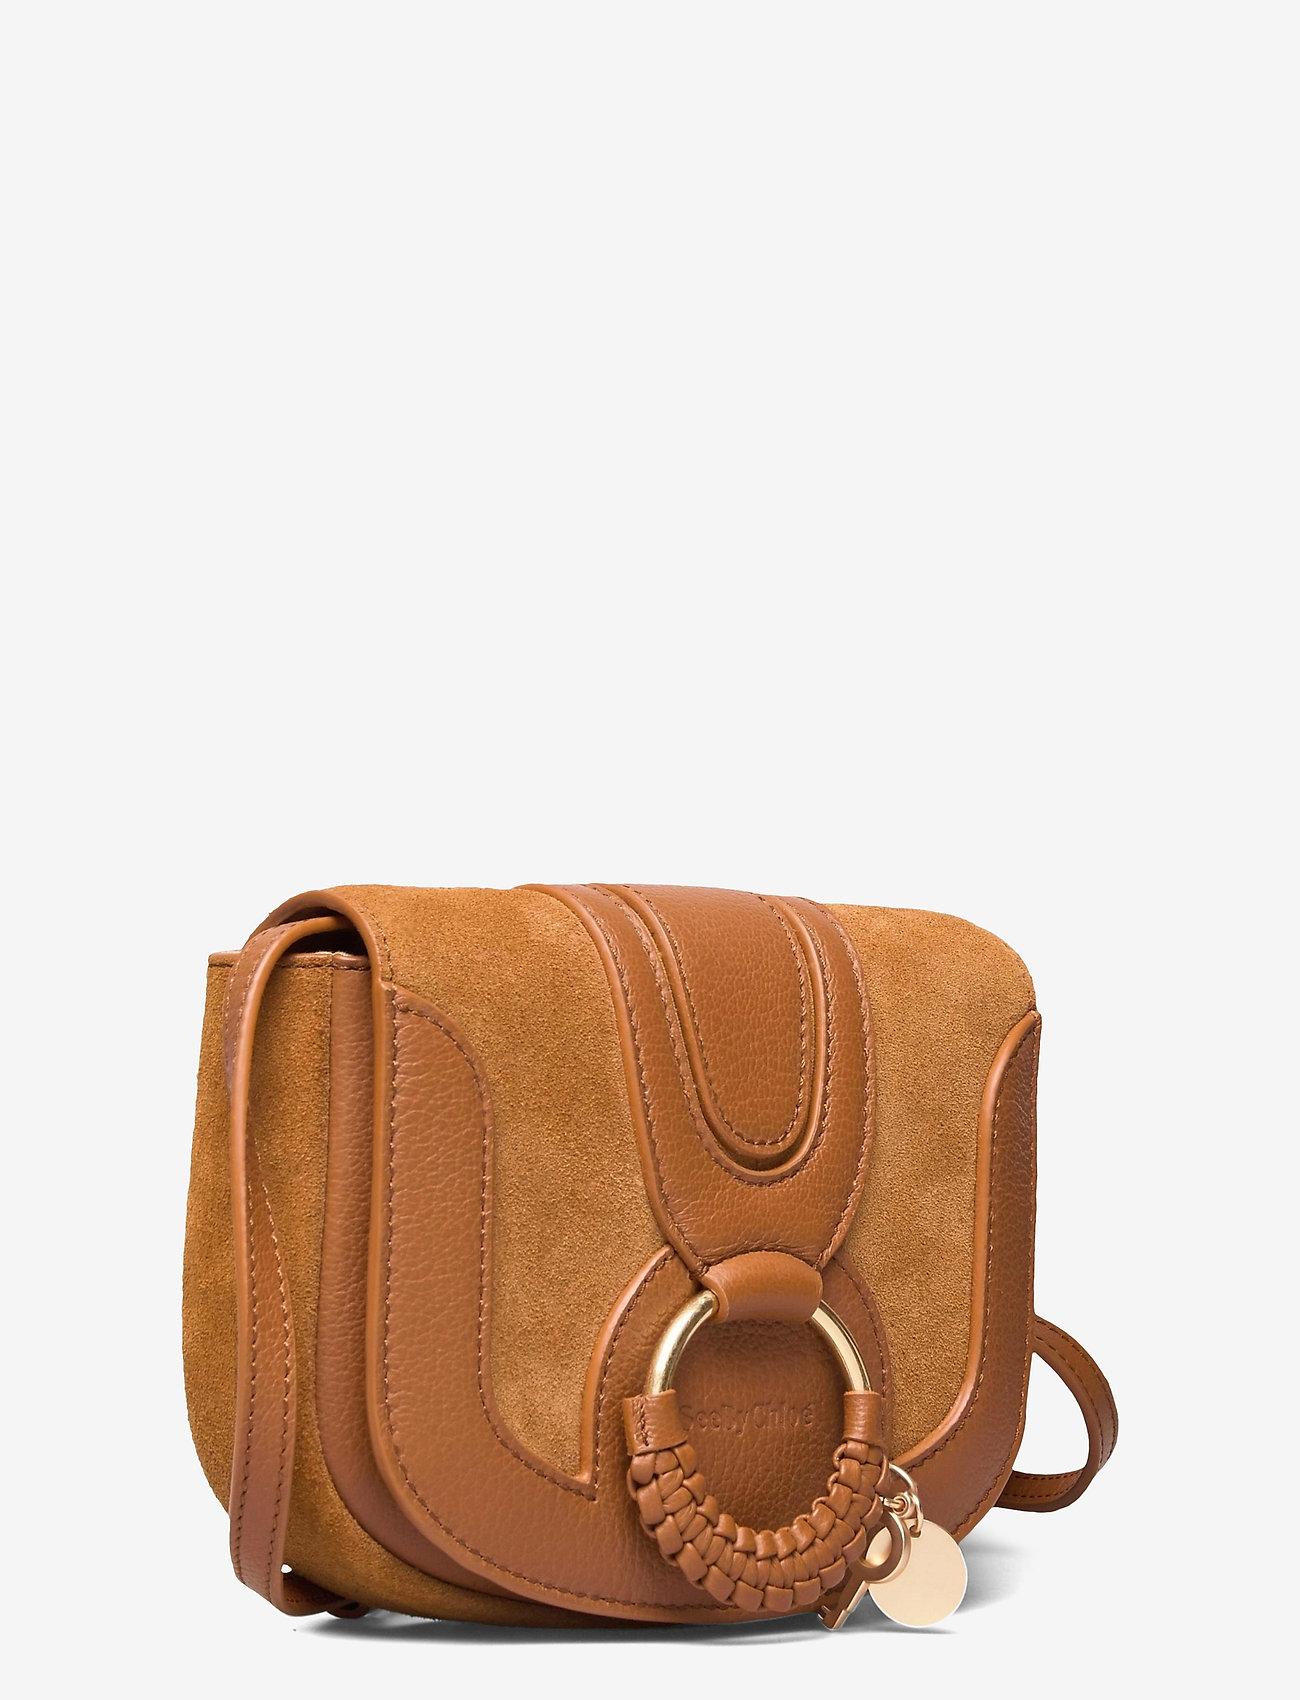 See by Chloé - HANA SBC - crossbody bags - caramello - 2